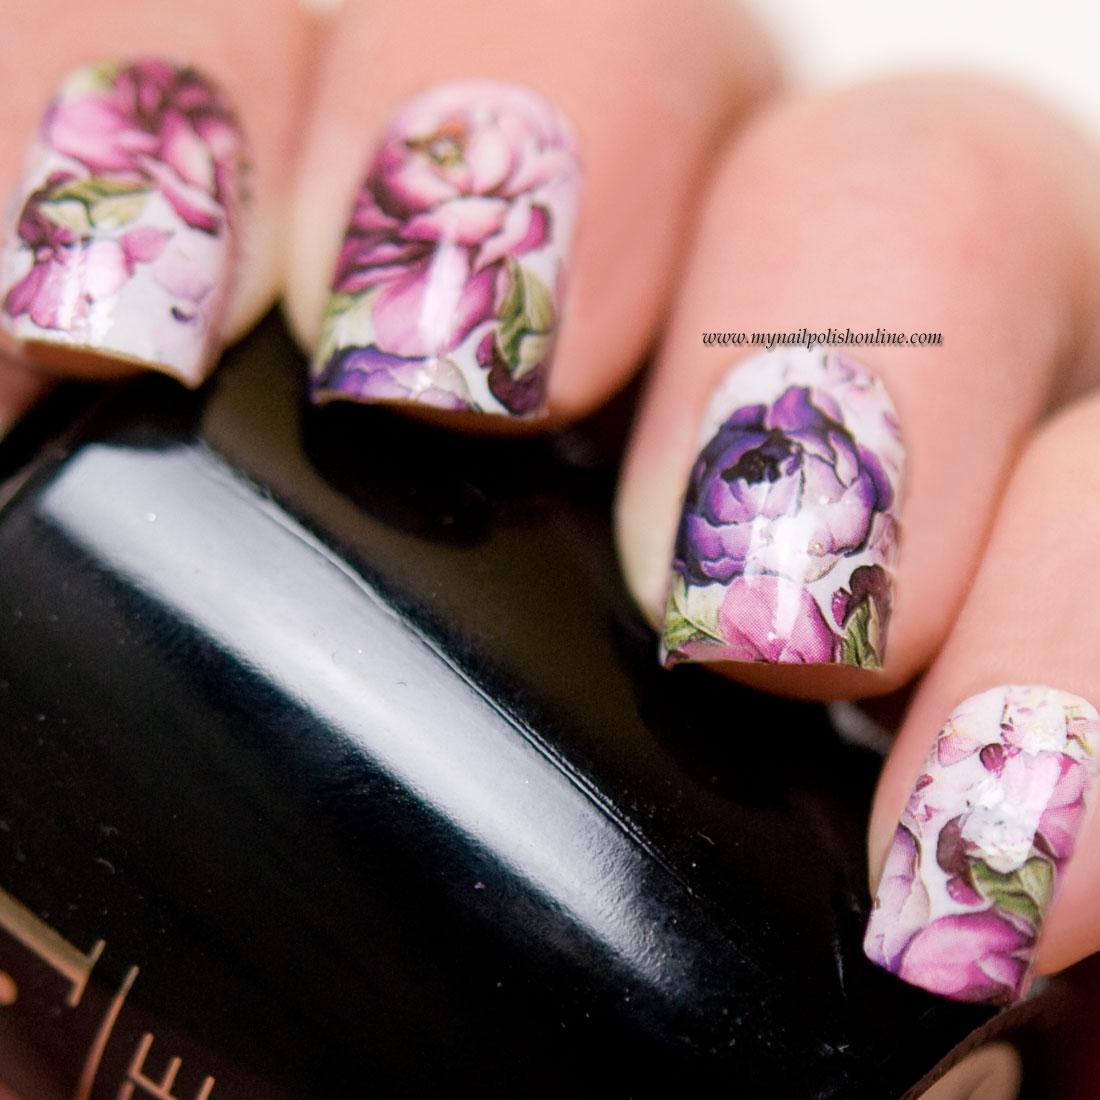 Floral nail wraps - Saijtam